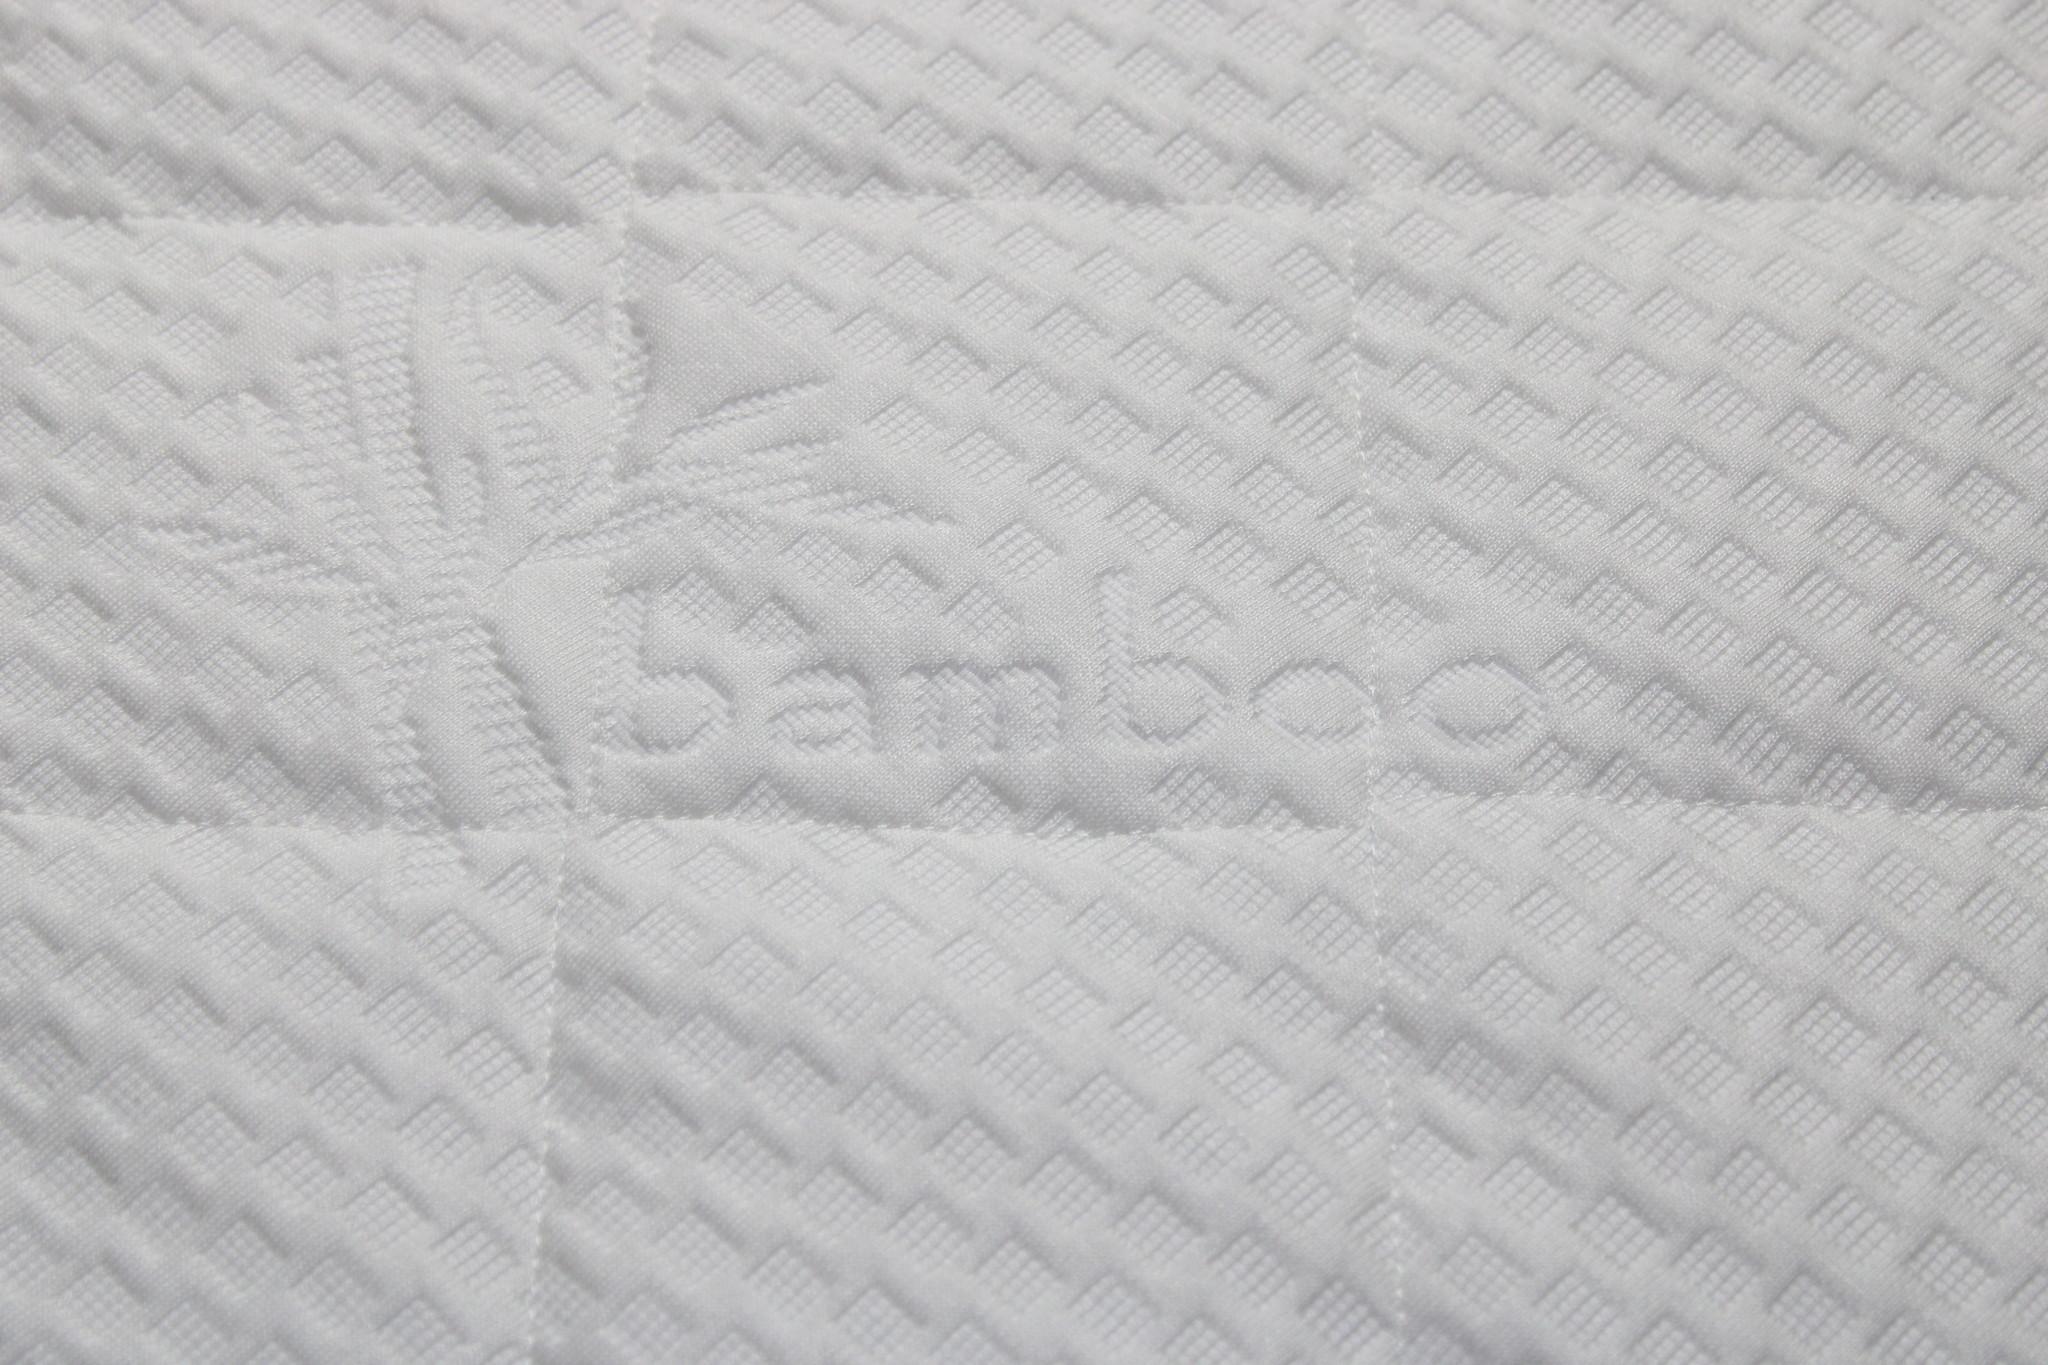 Sarpy Kindermatras 75x160 koudschuim HR55 bamboo